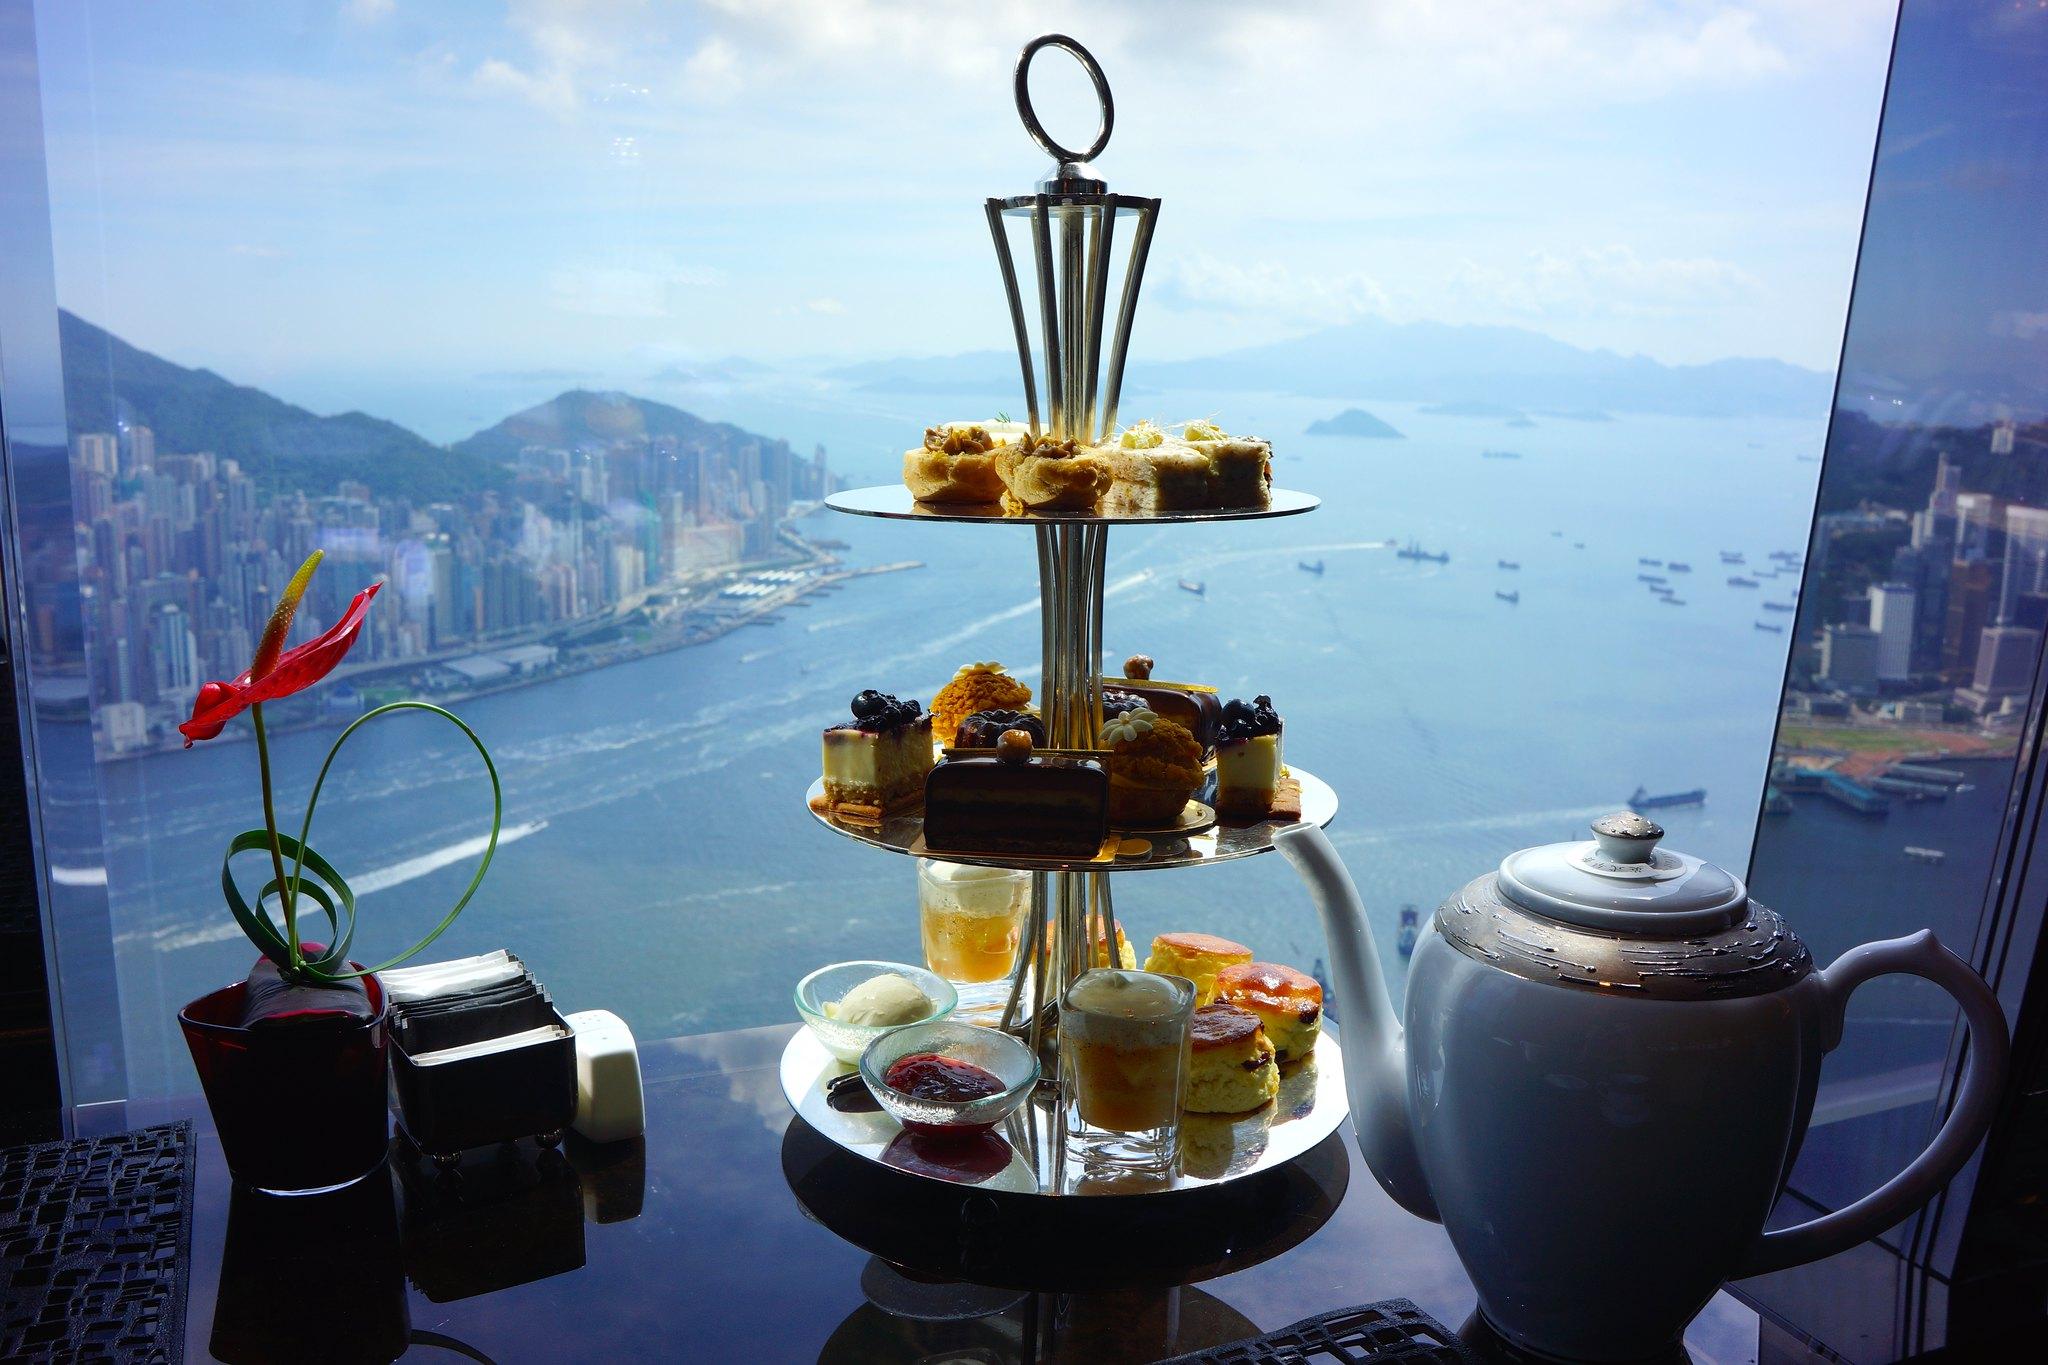 The Lounge & Bar Hong Kong Afternoon Tea Review